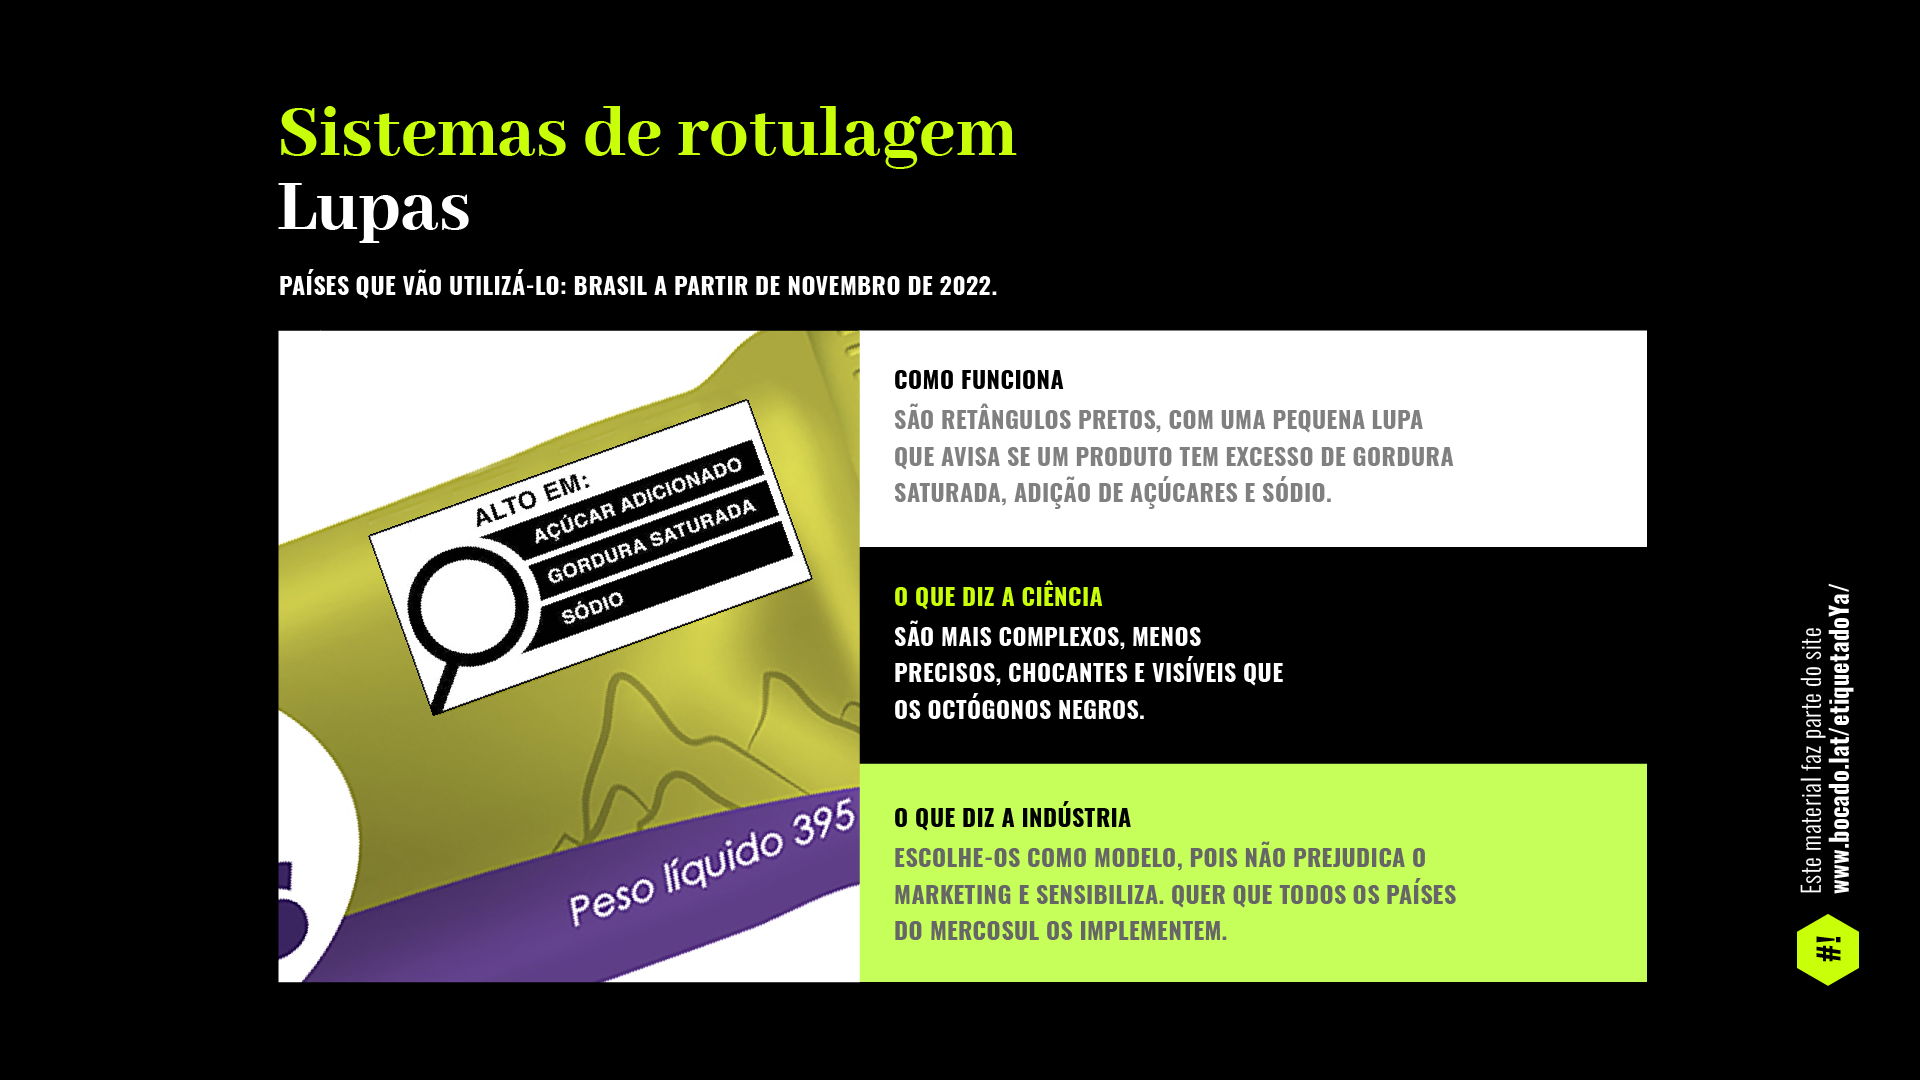 Sistemas_etiquetado_6_Bocado